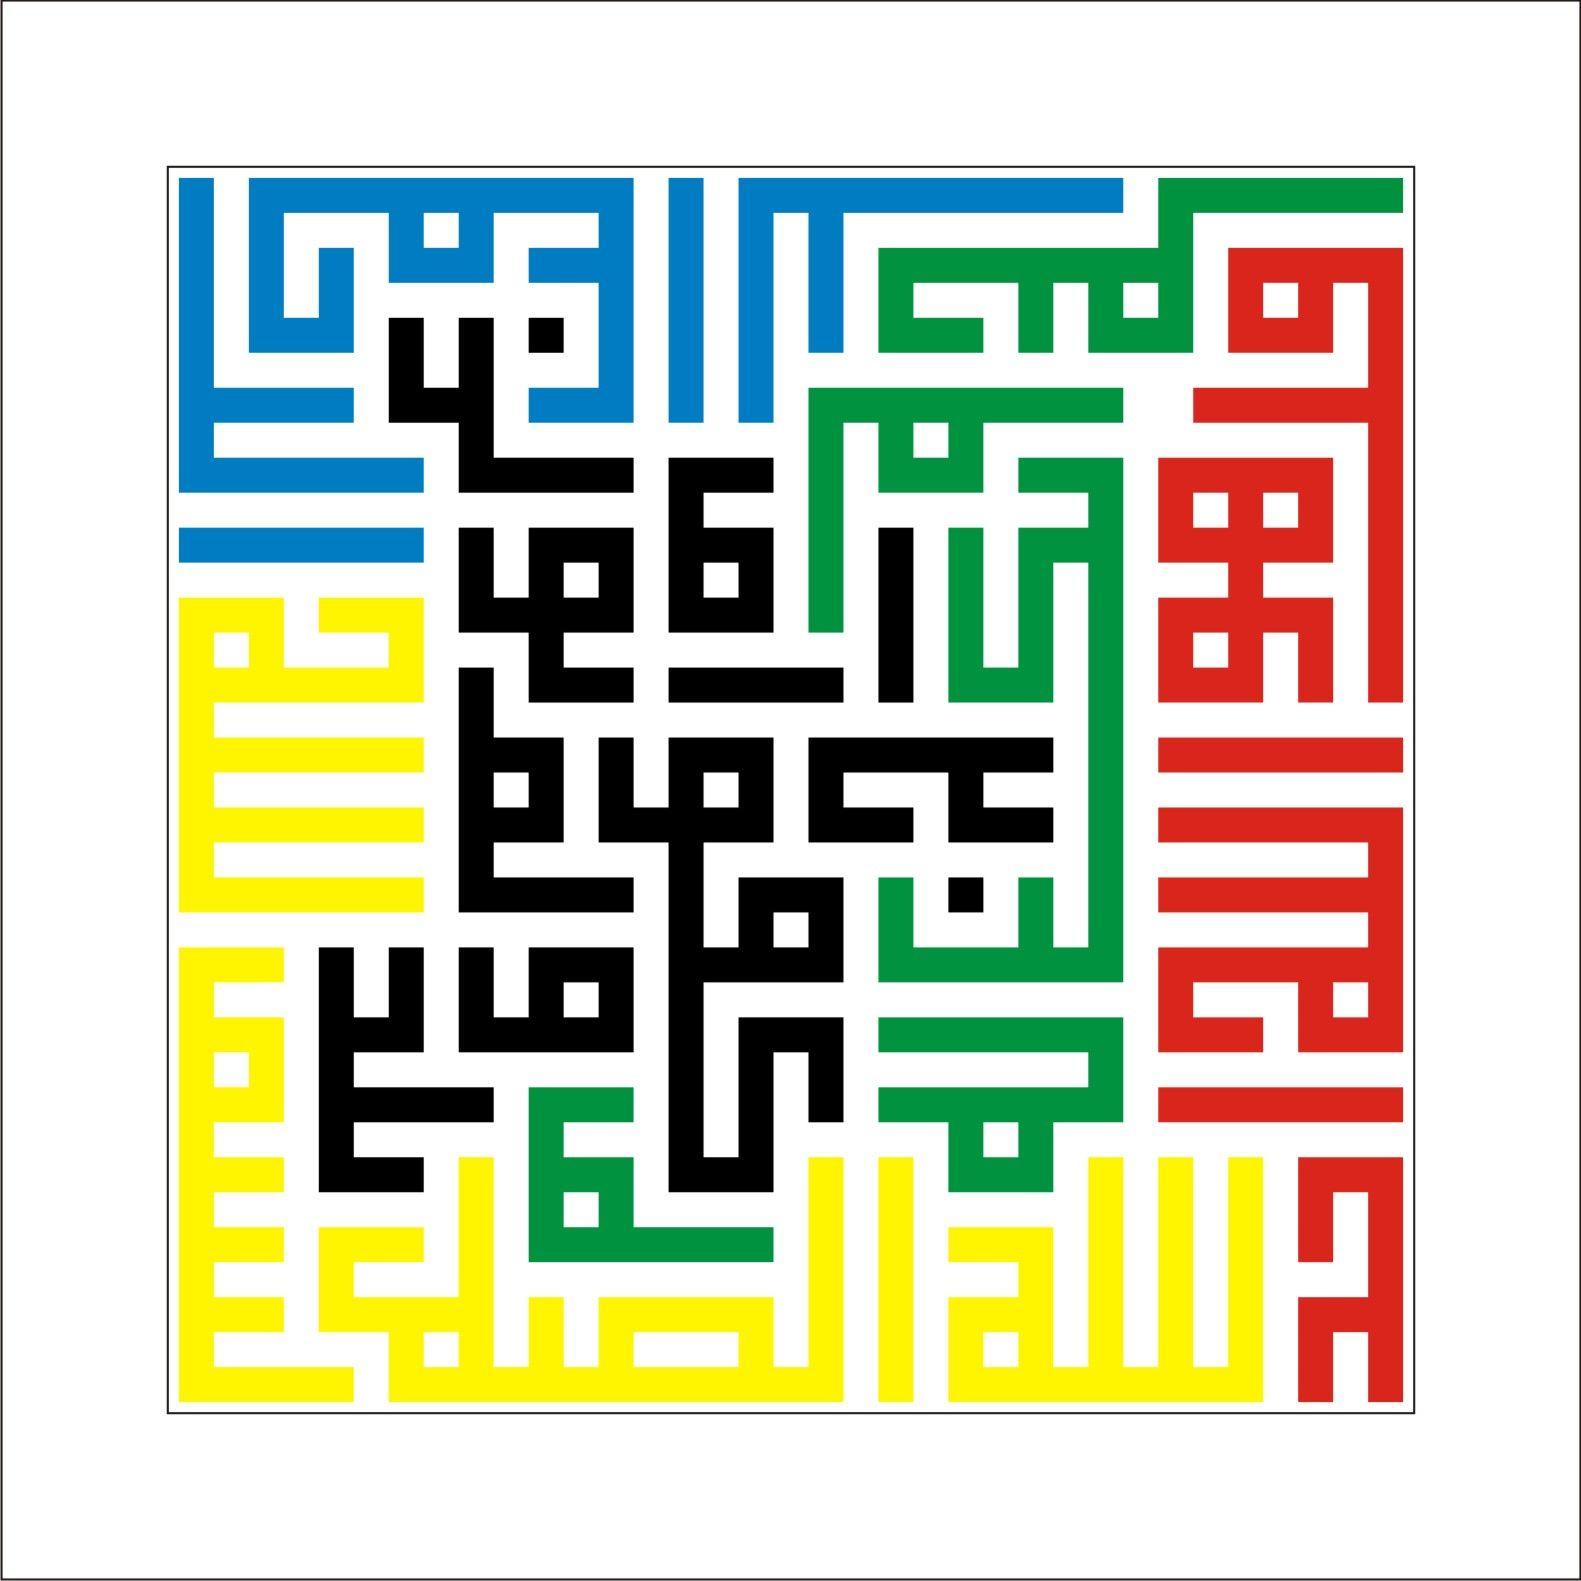 Surah AlIkhlas Sanat, Ale, Hat sanatı